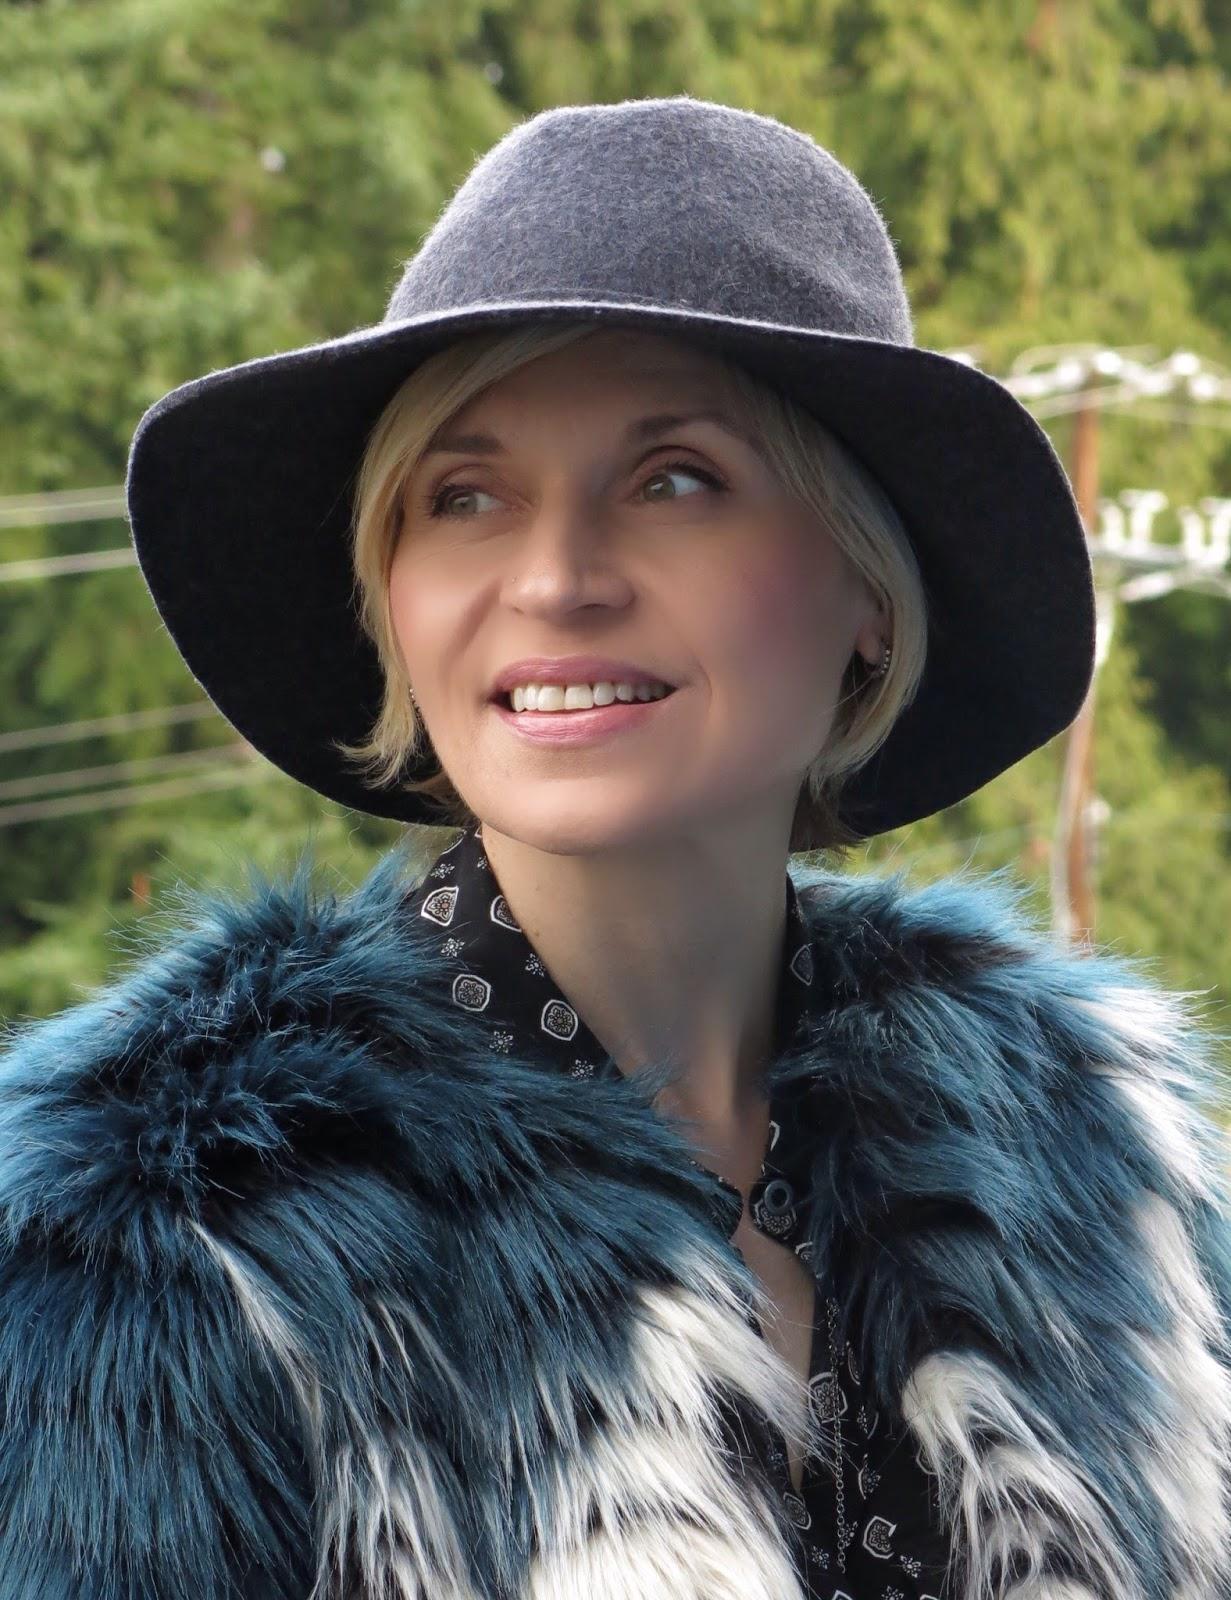 faux-fur jacket, patterned shirt, floppy hat